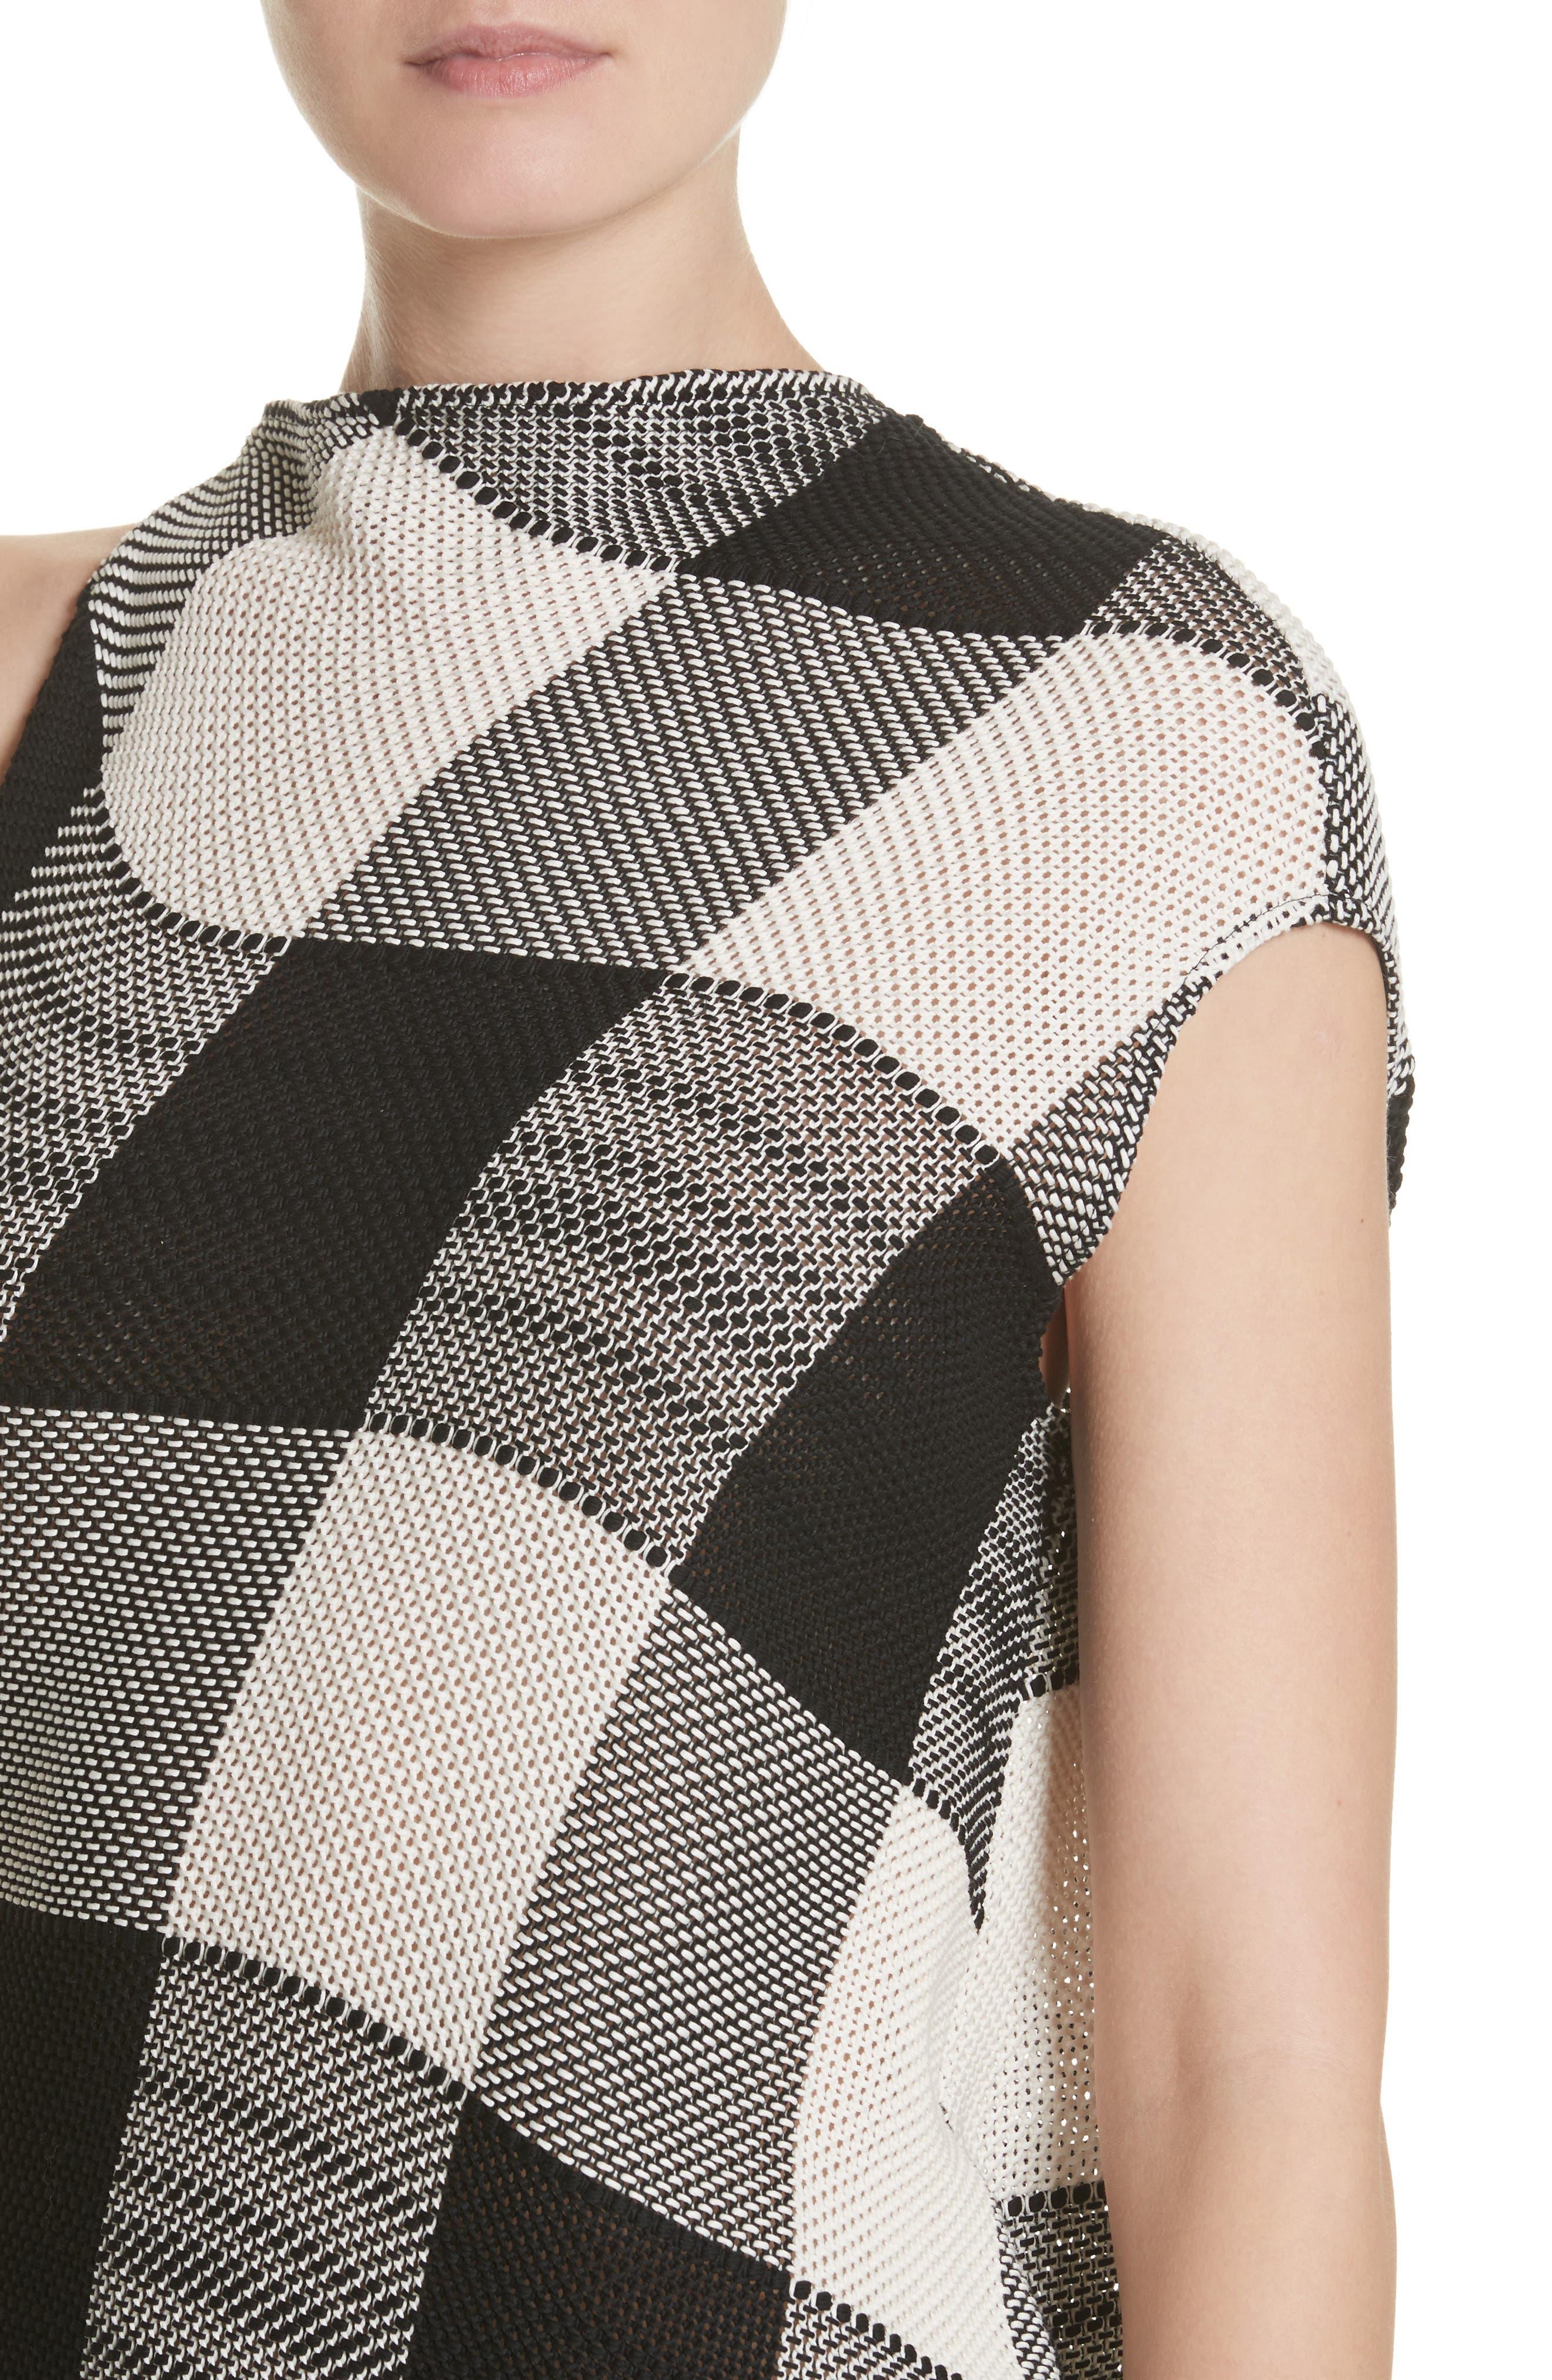 Marques'Almeida Asymmetrical Gingham Sheath Dress,                             Alternate thumbnail 4, color,                             Black/White